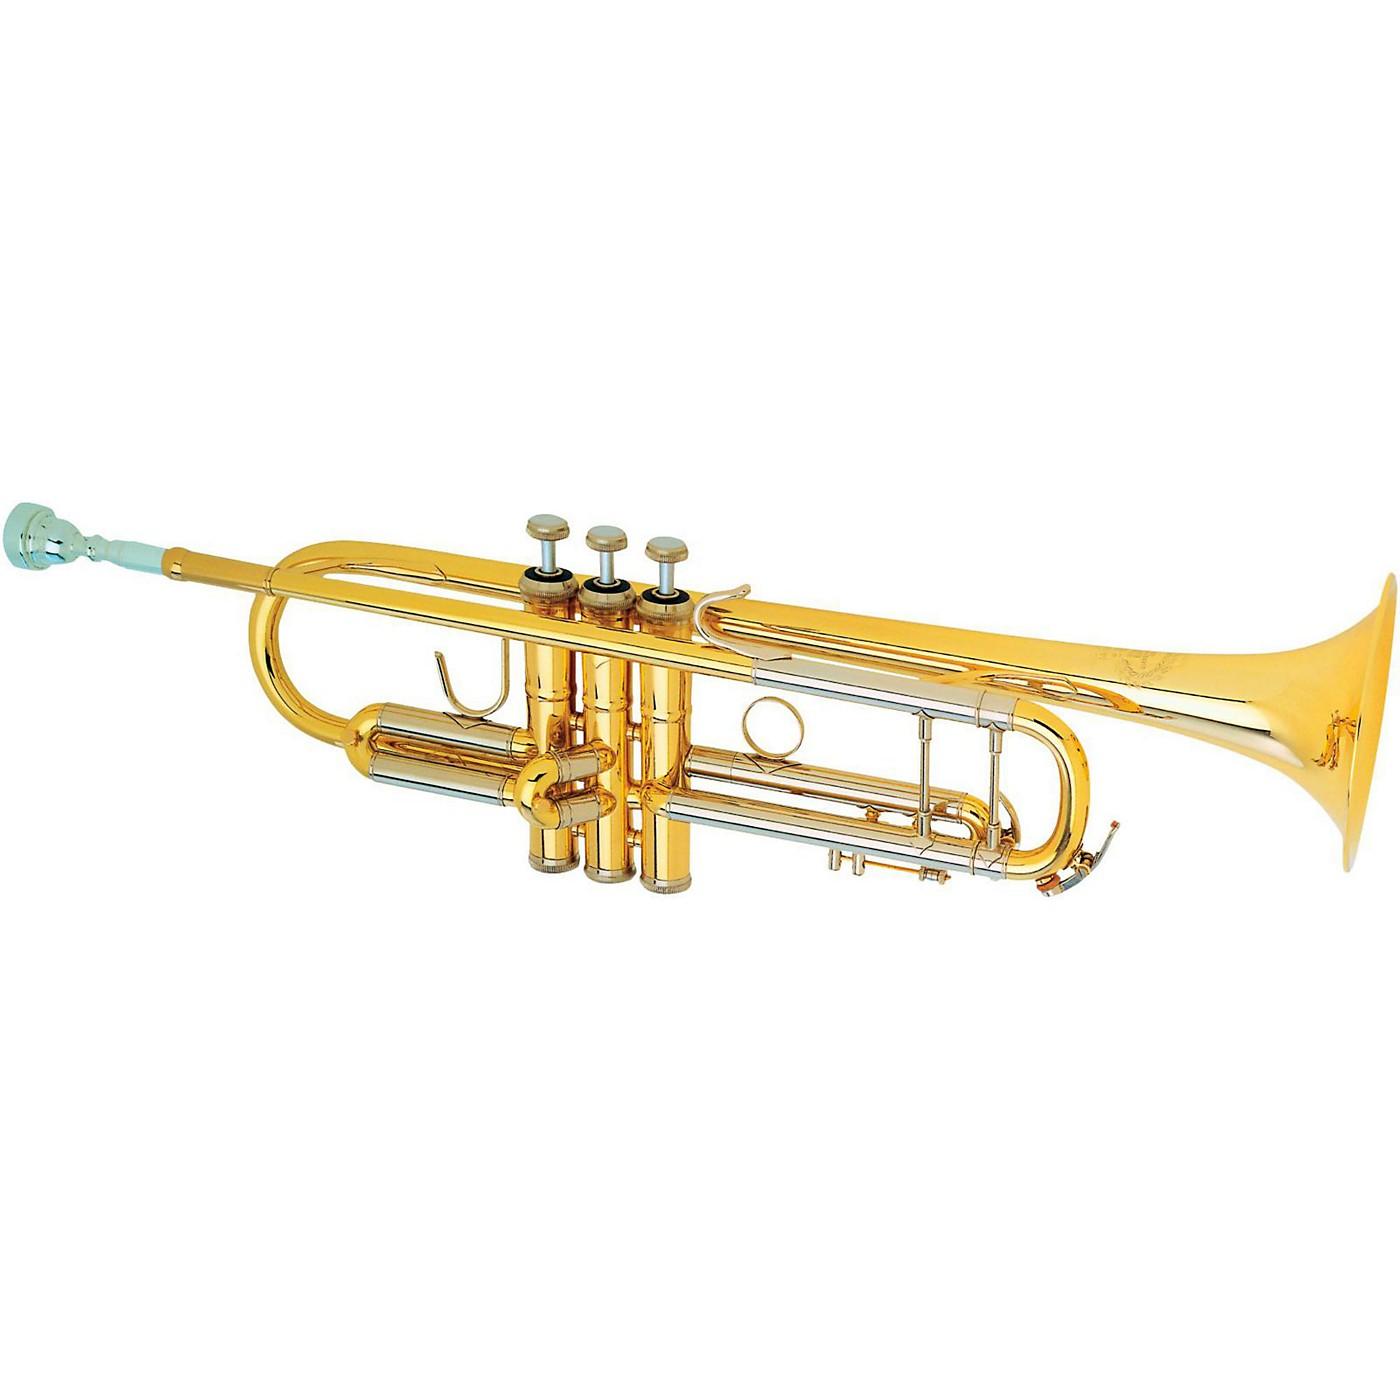 B&S 3137 Challenger I Series Bb Trumpet thumbnail